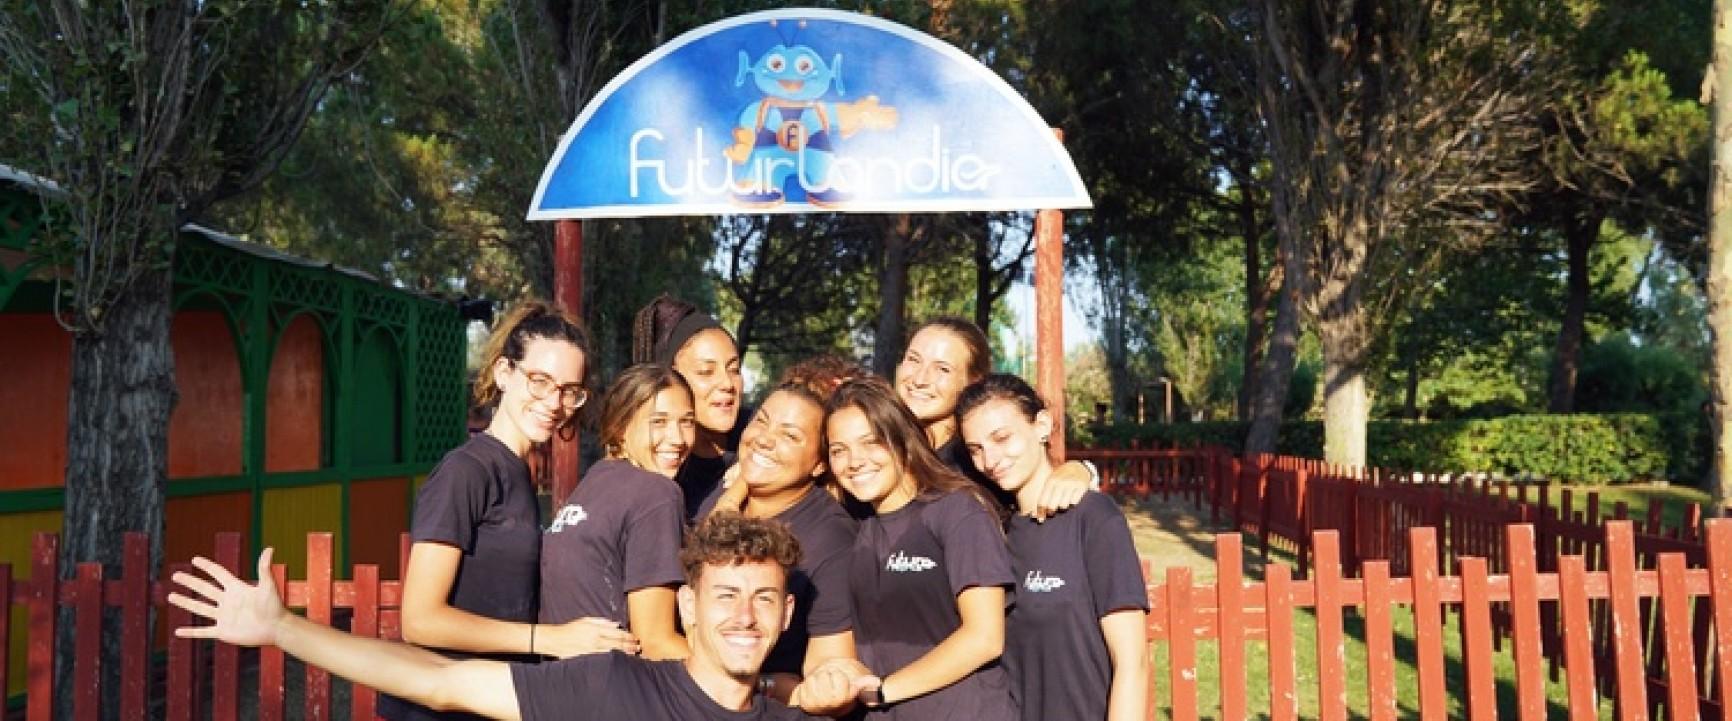 Futura Club Itaca Nausicaa